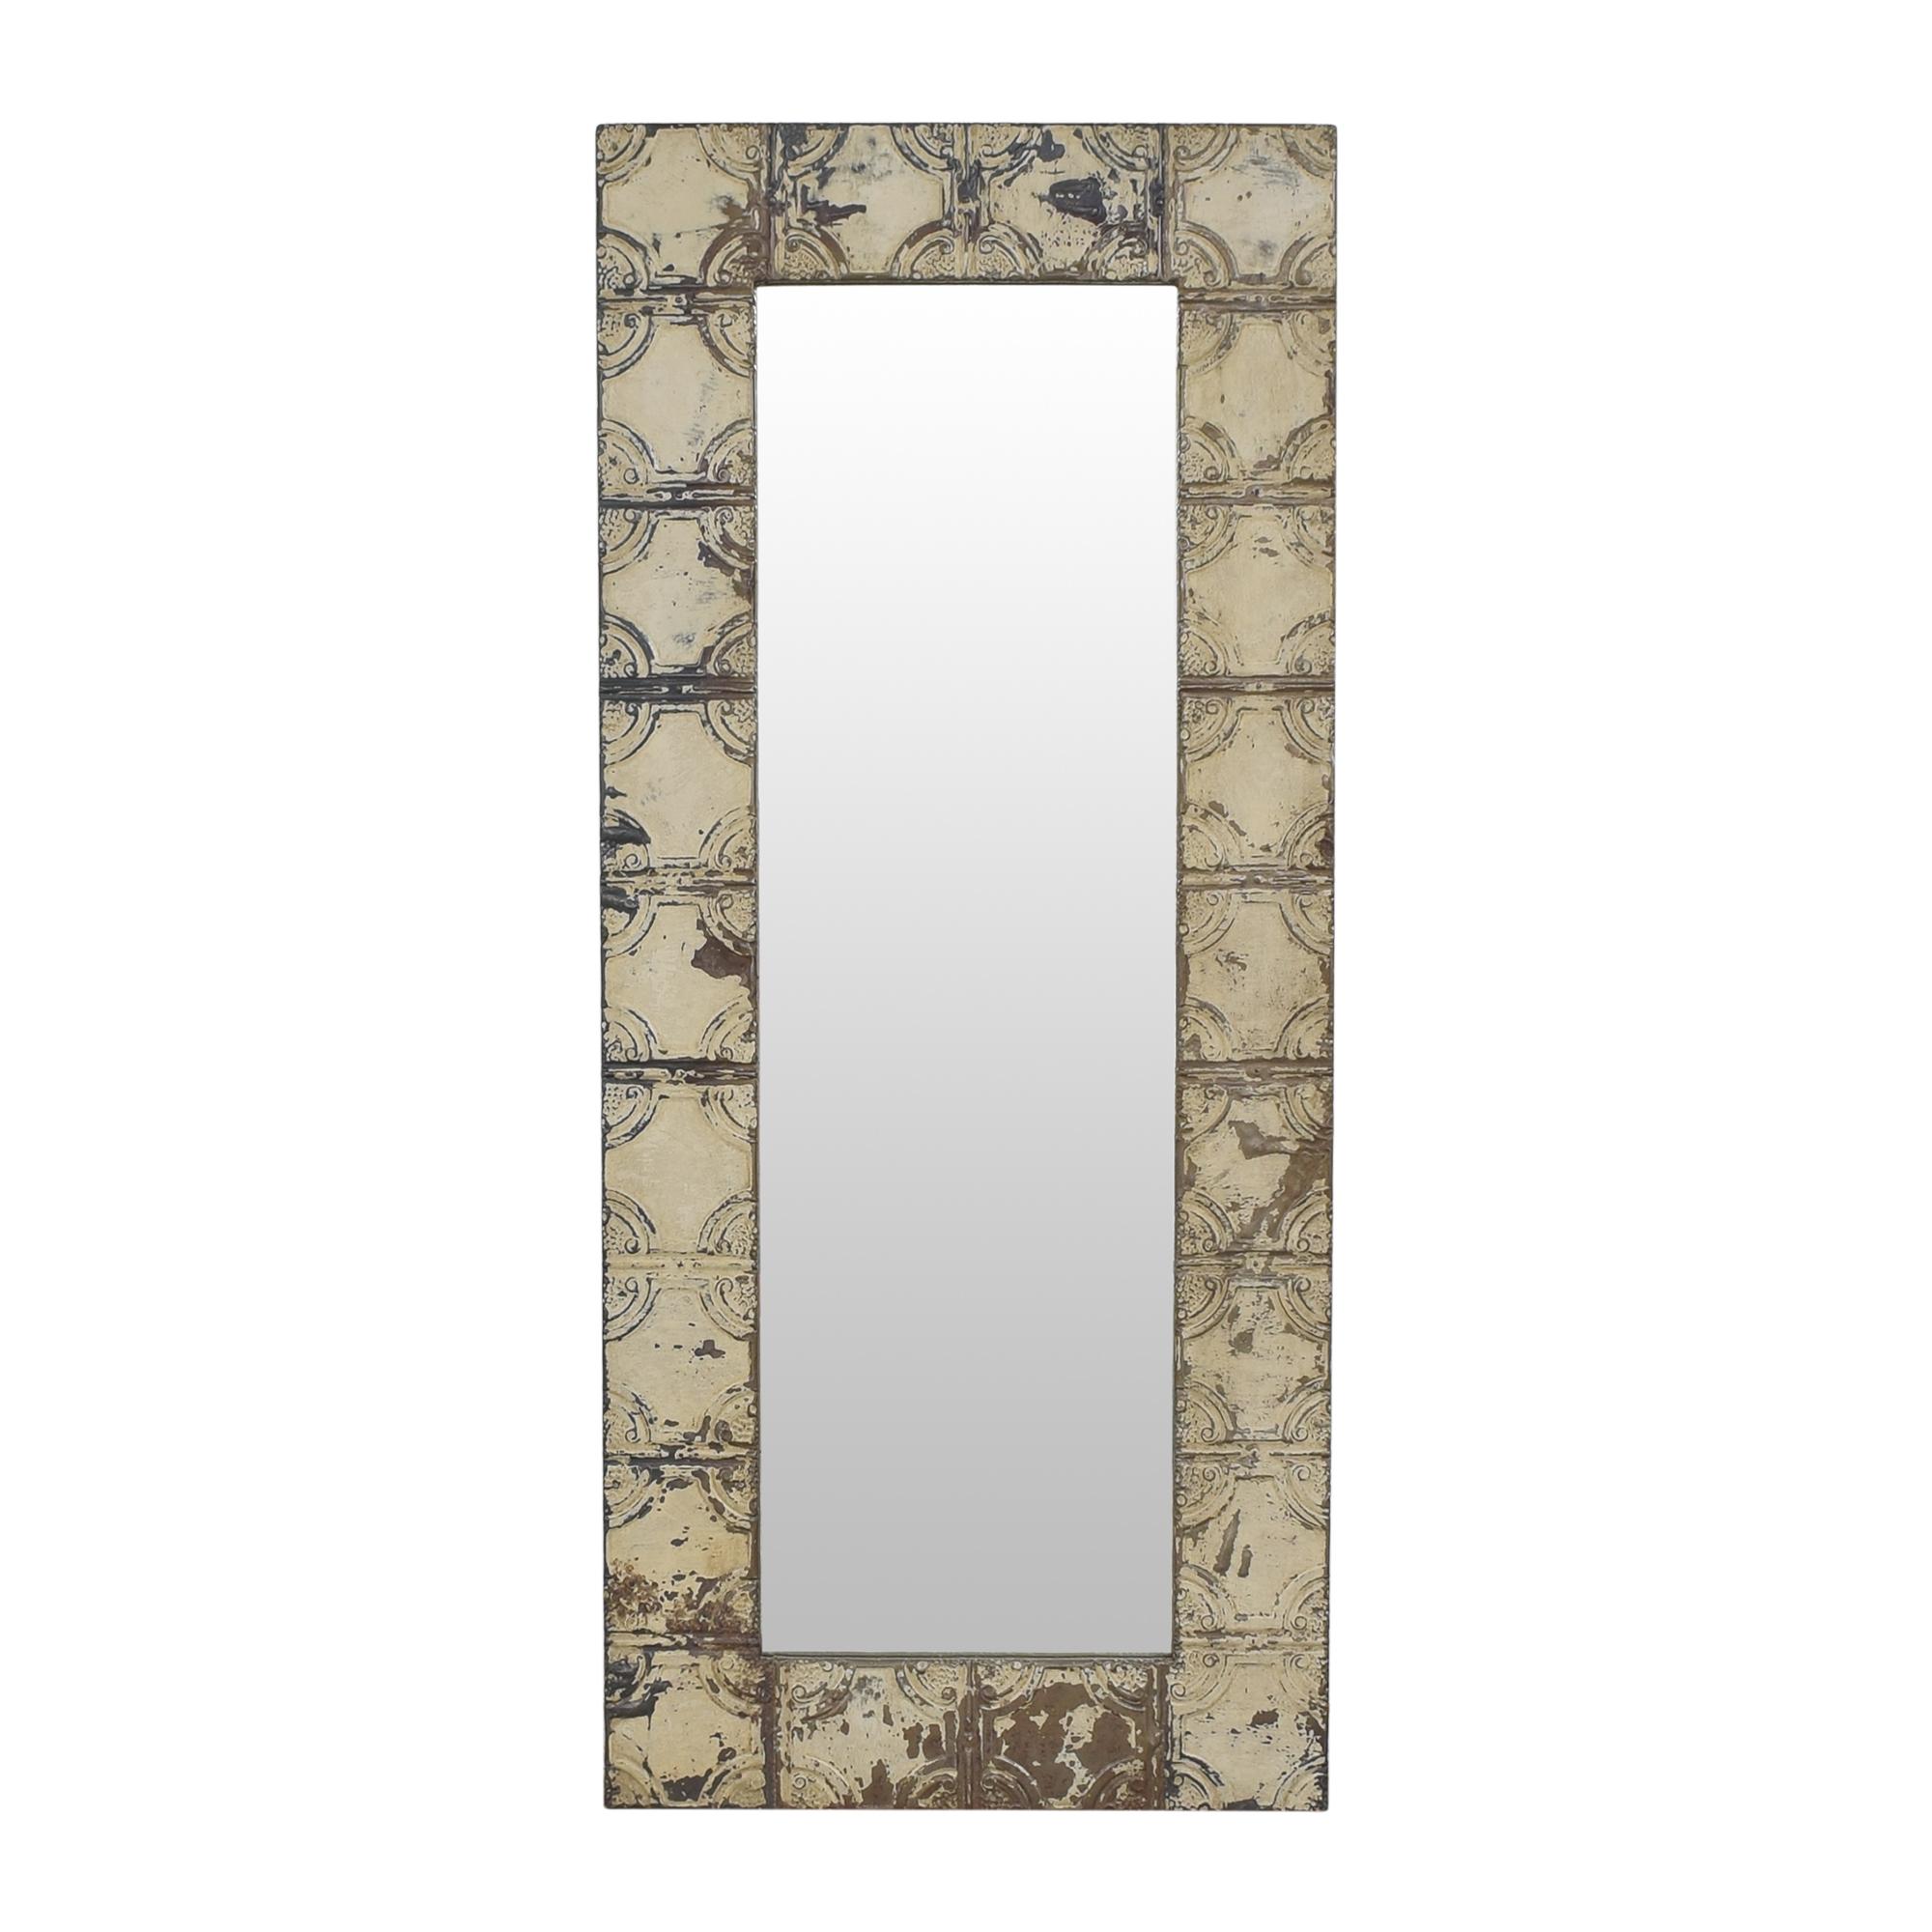 Vintage Style Floor Mirror off white